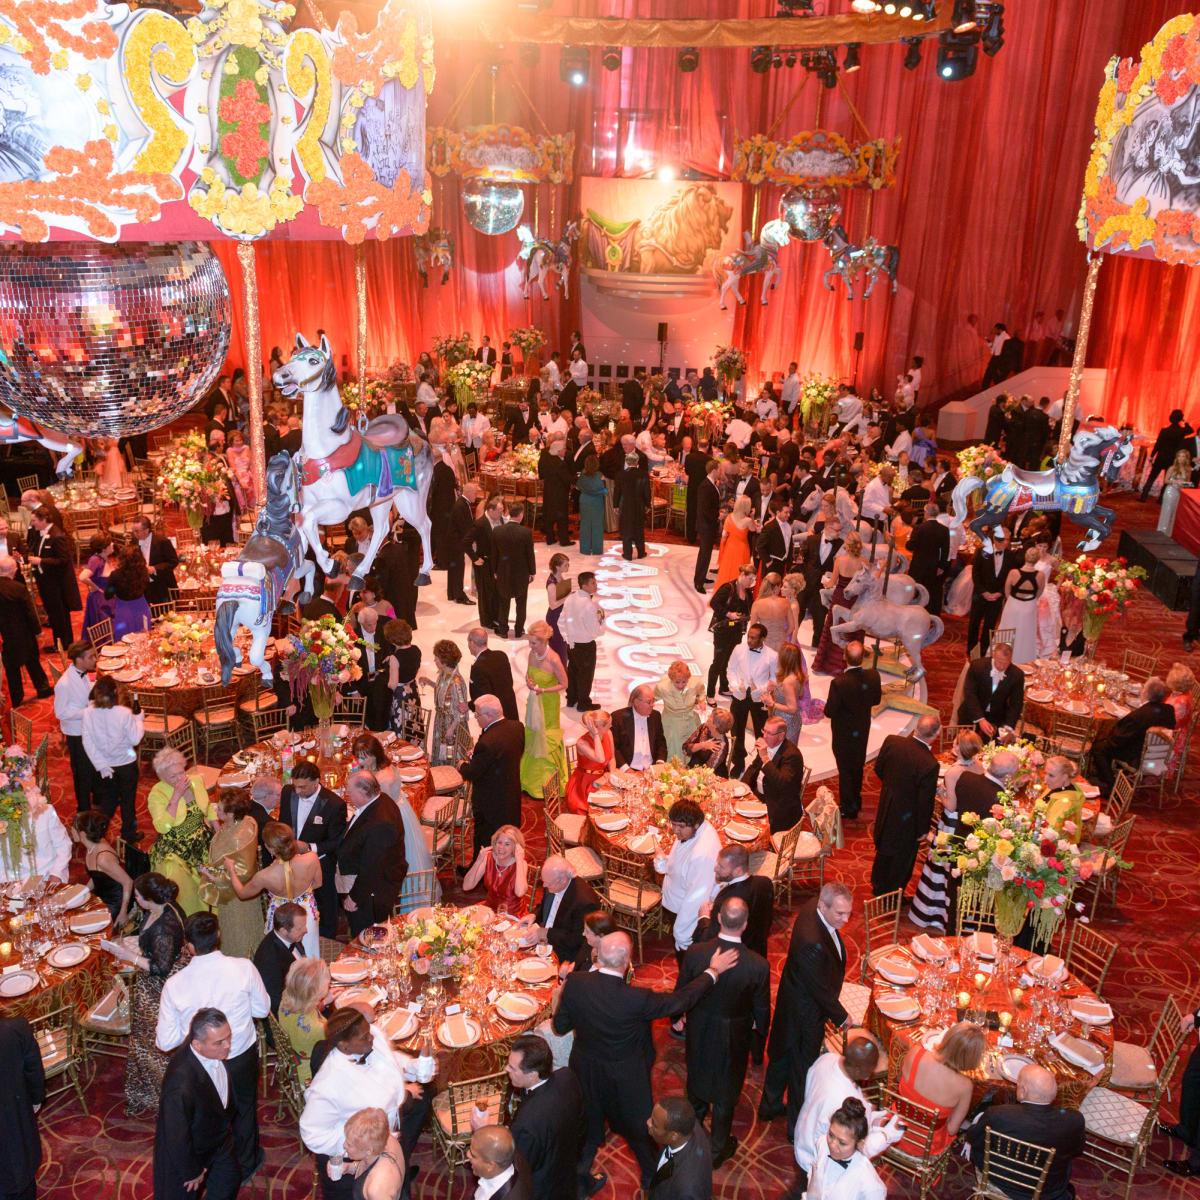 Houston Grand Opera Ball, April 2016 decor